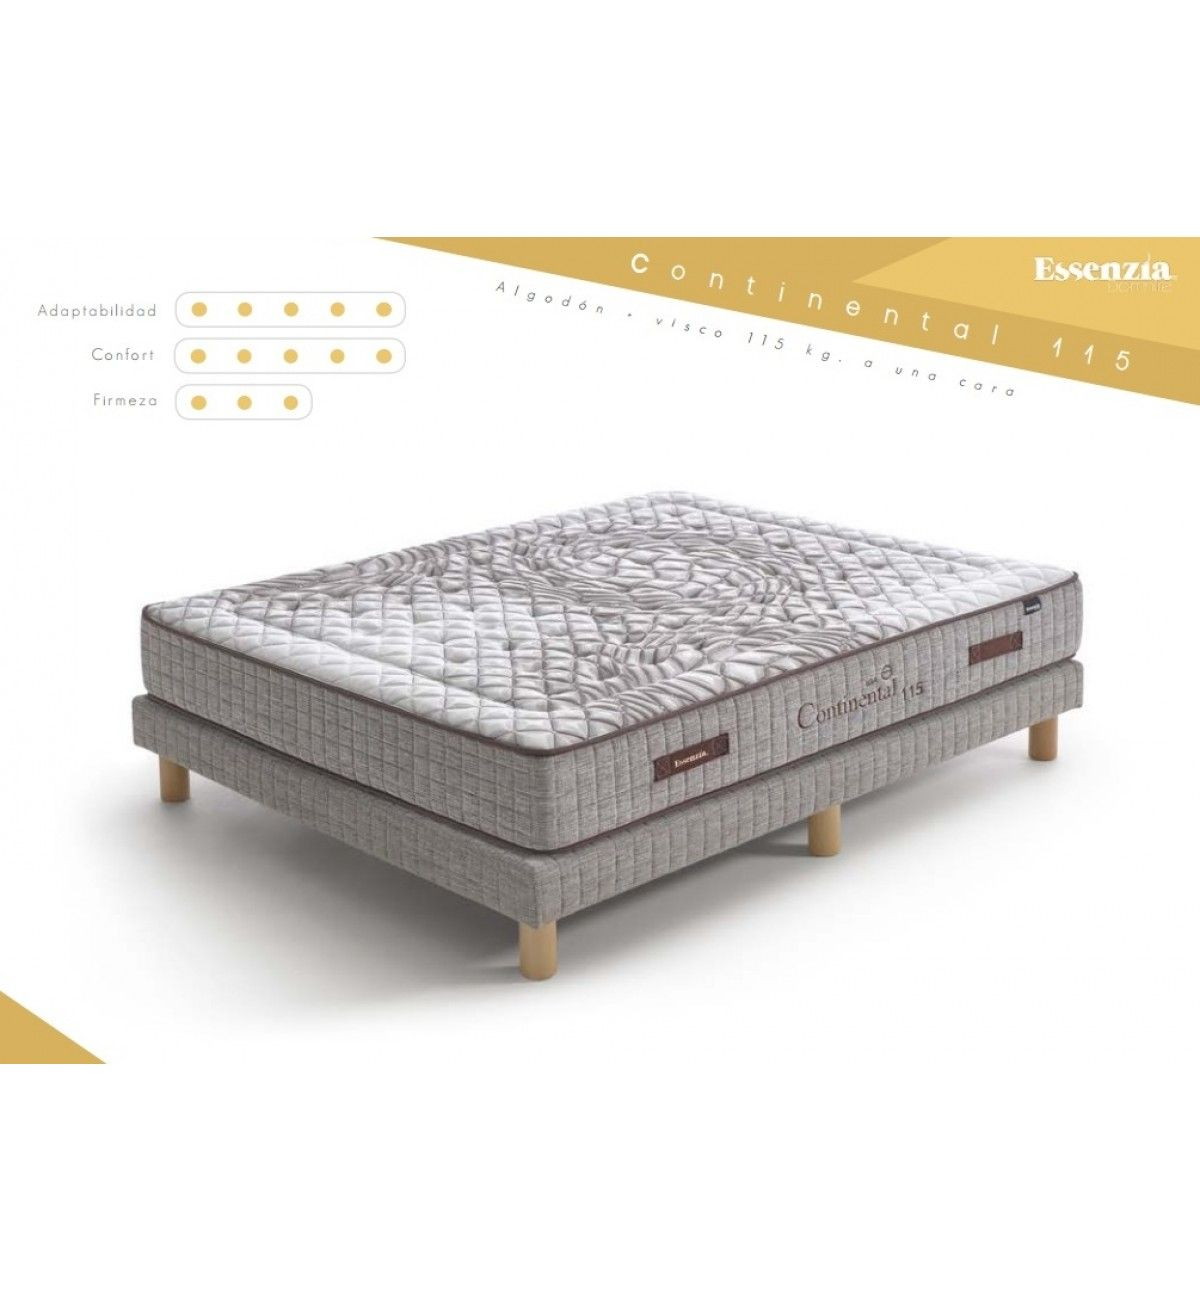 Essenzia Dormire Continental 115 Colchon Colchones Camas